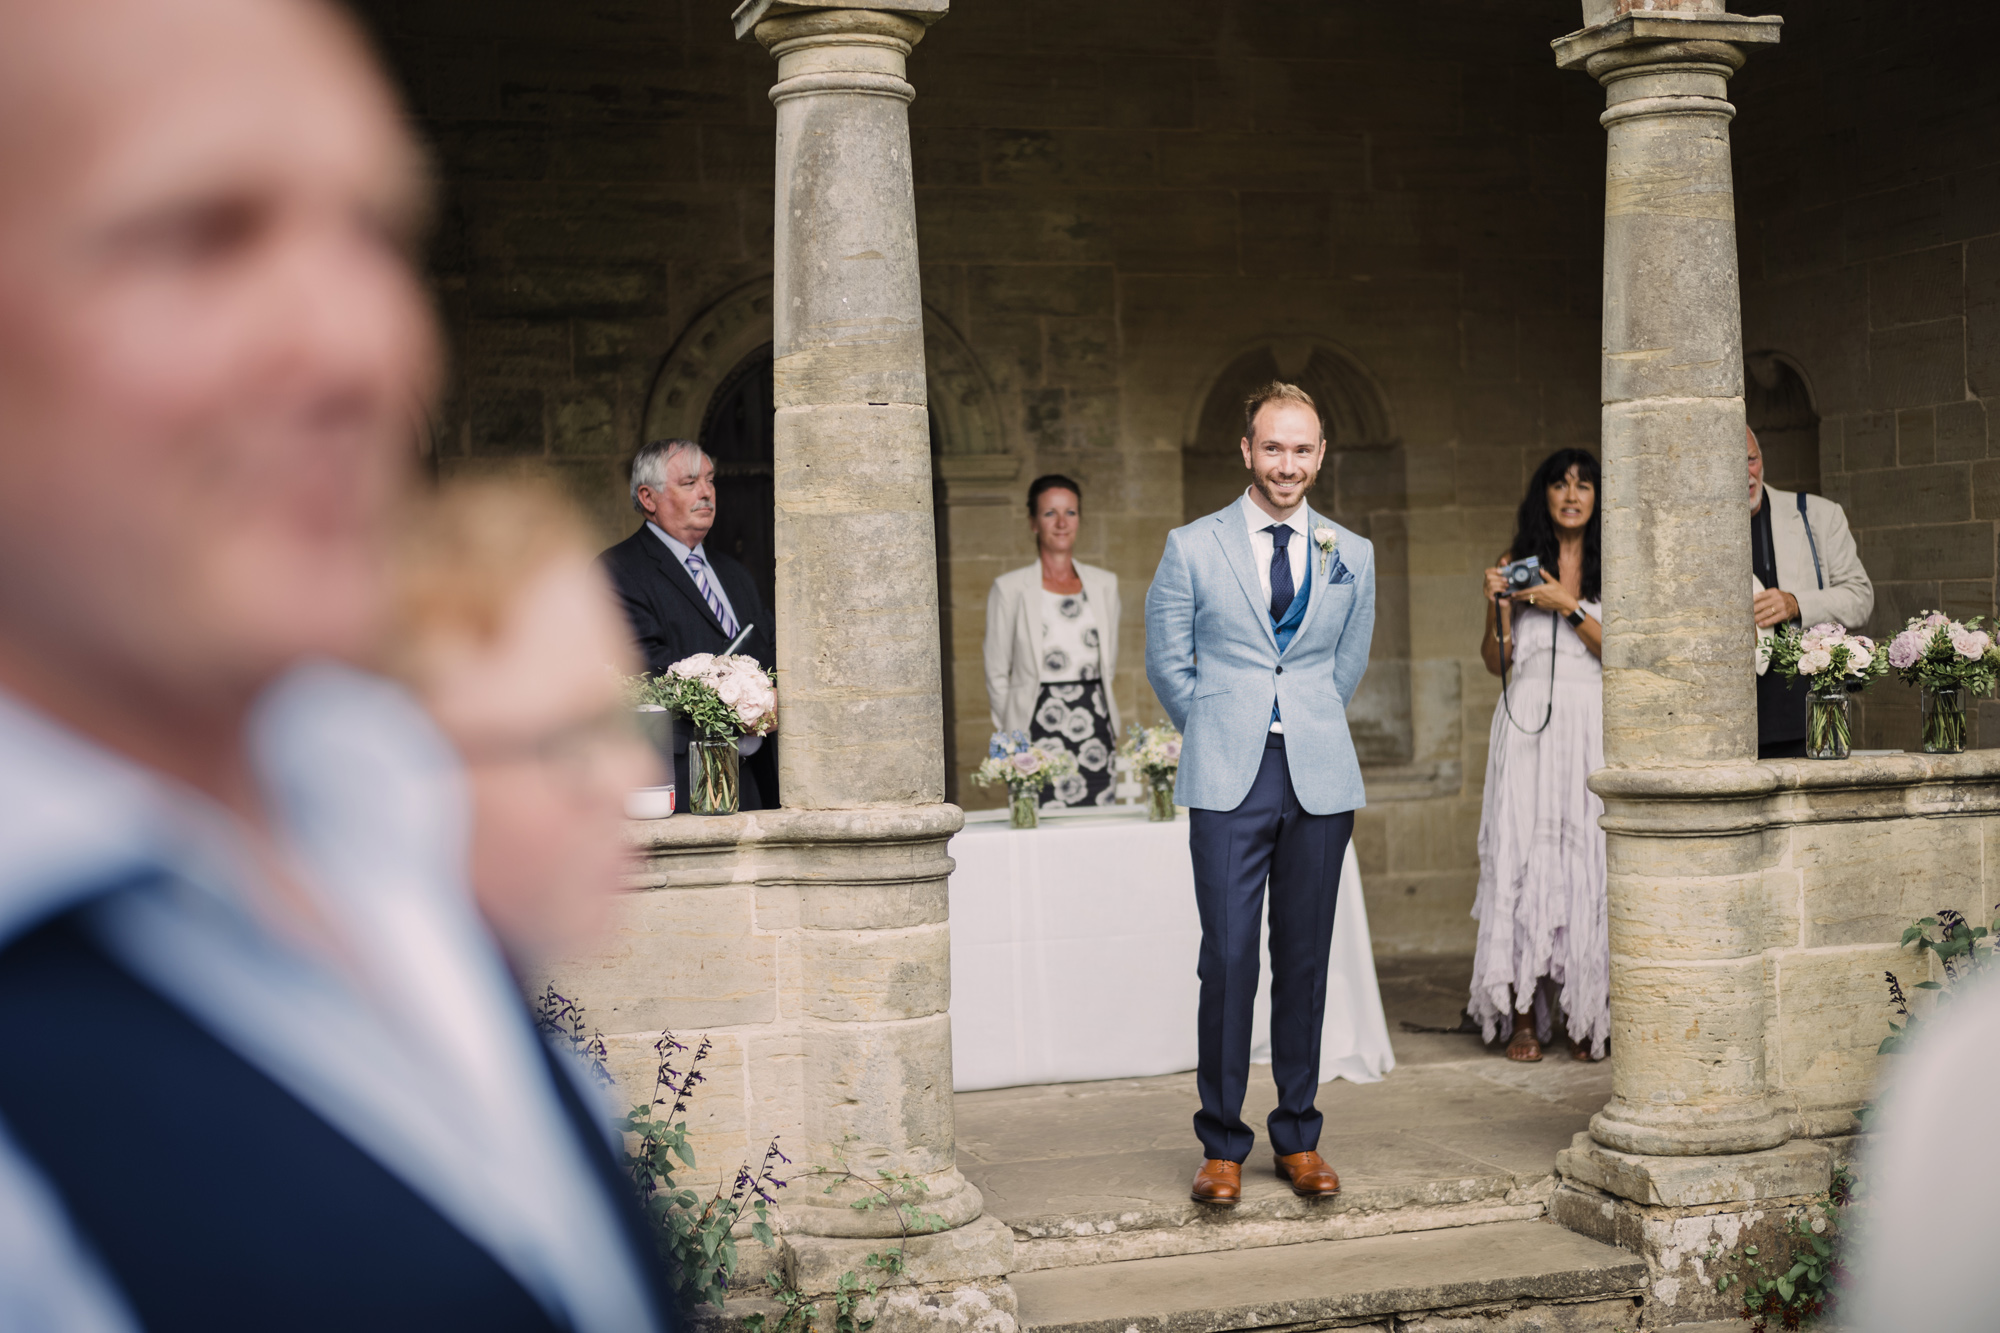 Jaz-Kate-Beaumont-Oyster-Silk-Bias-Cut-Wedding-Gown-Larkspur-Lace-Top-Sussex-Wedding-4.jpg